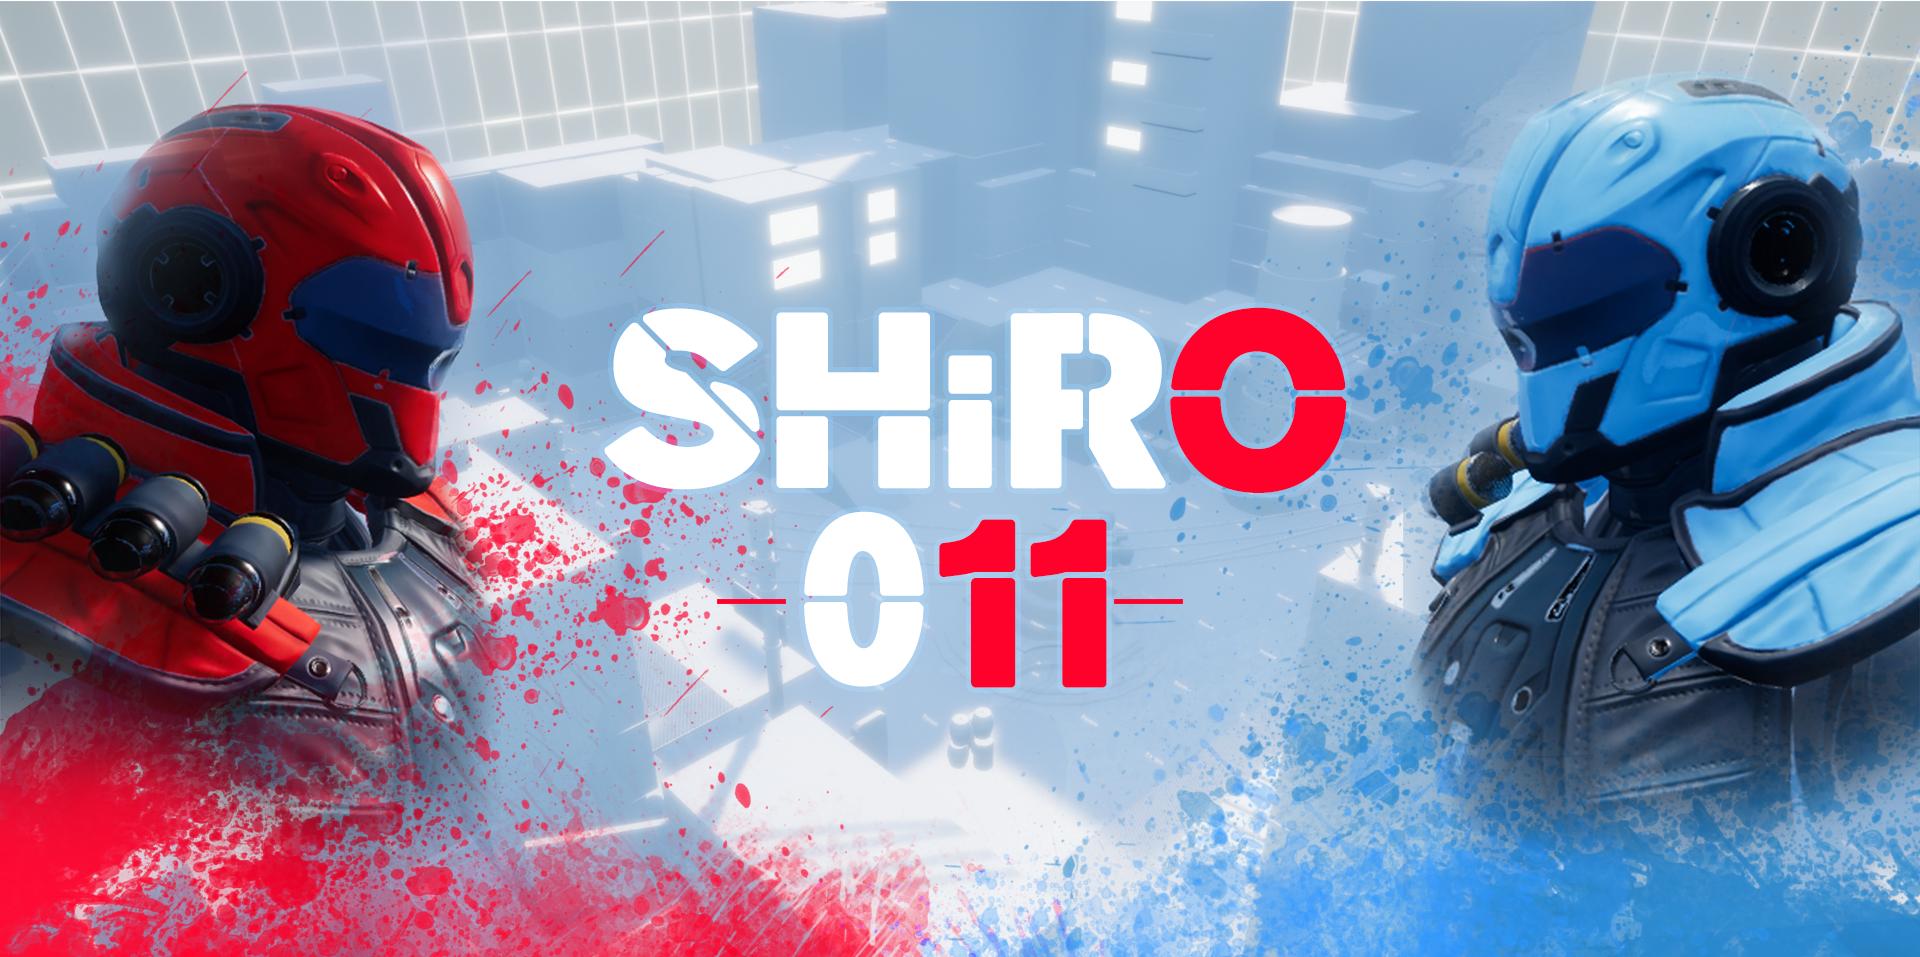 SHiRO 011 Cover